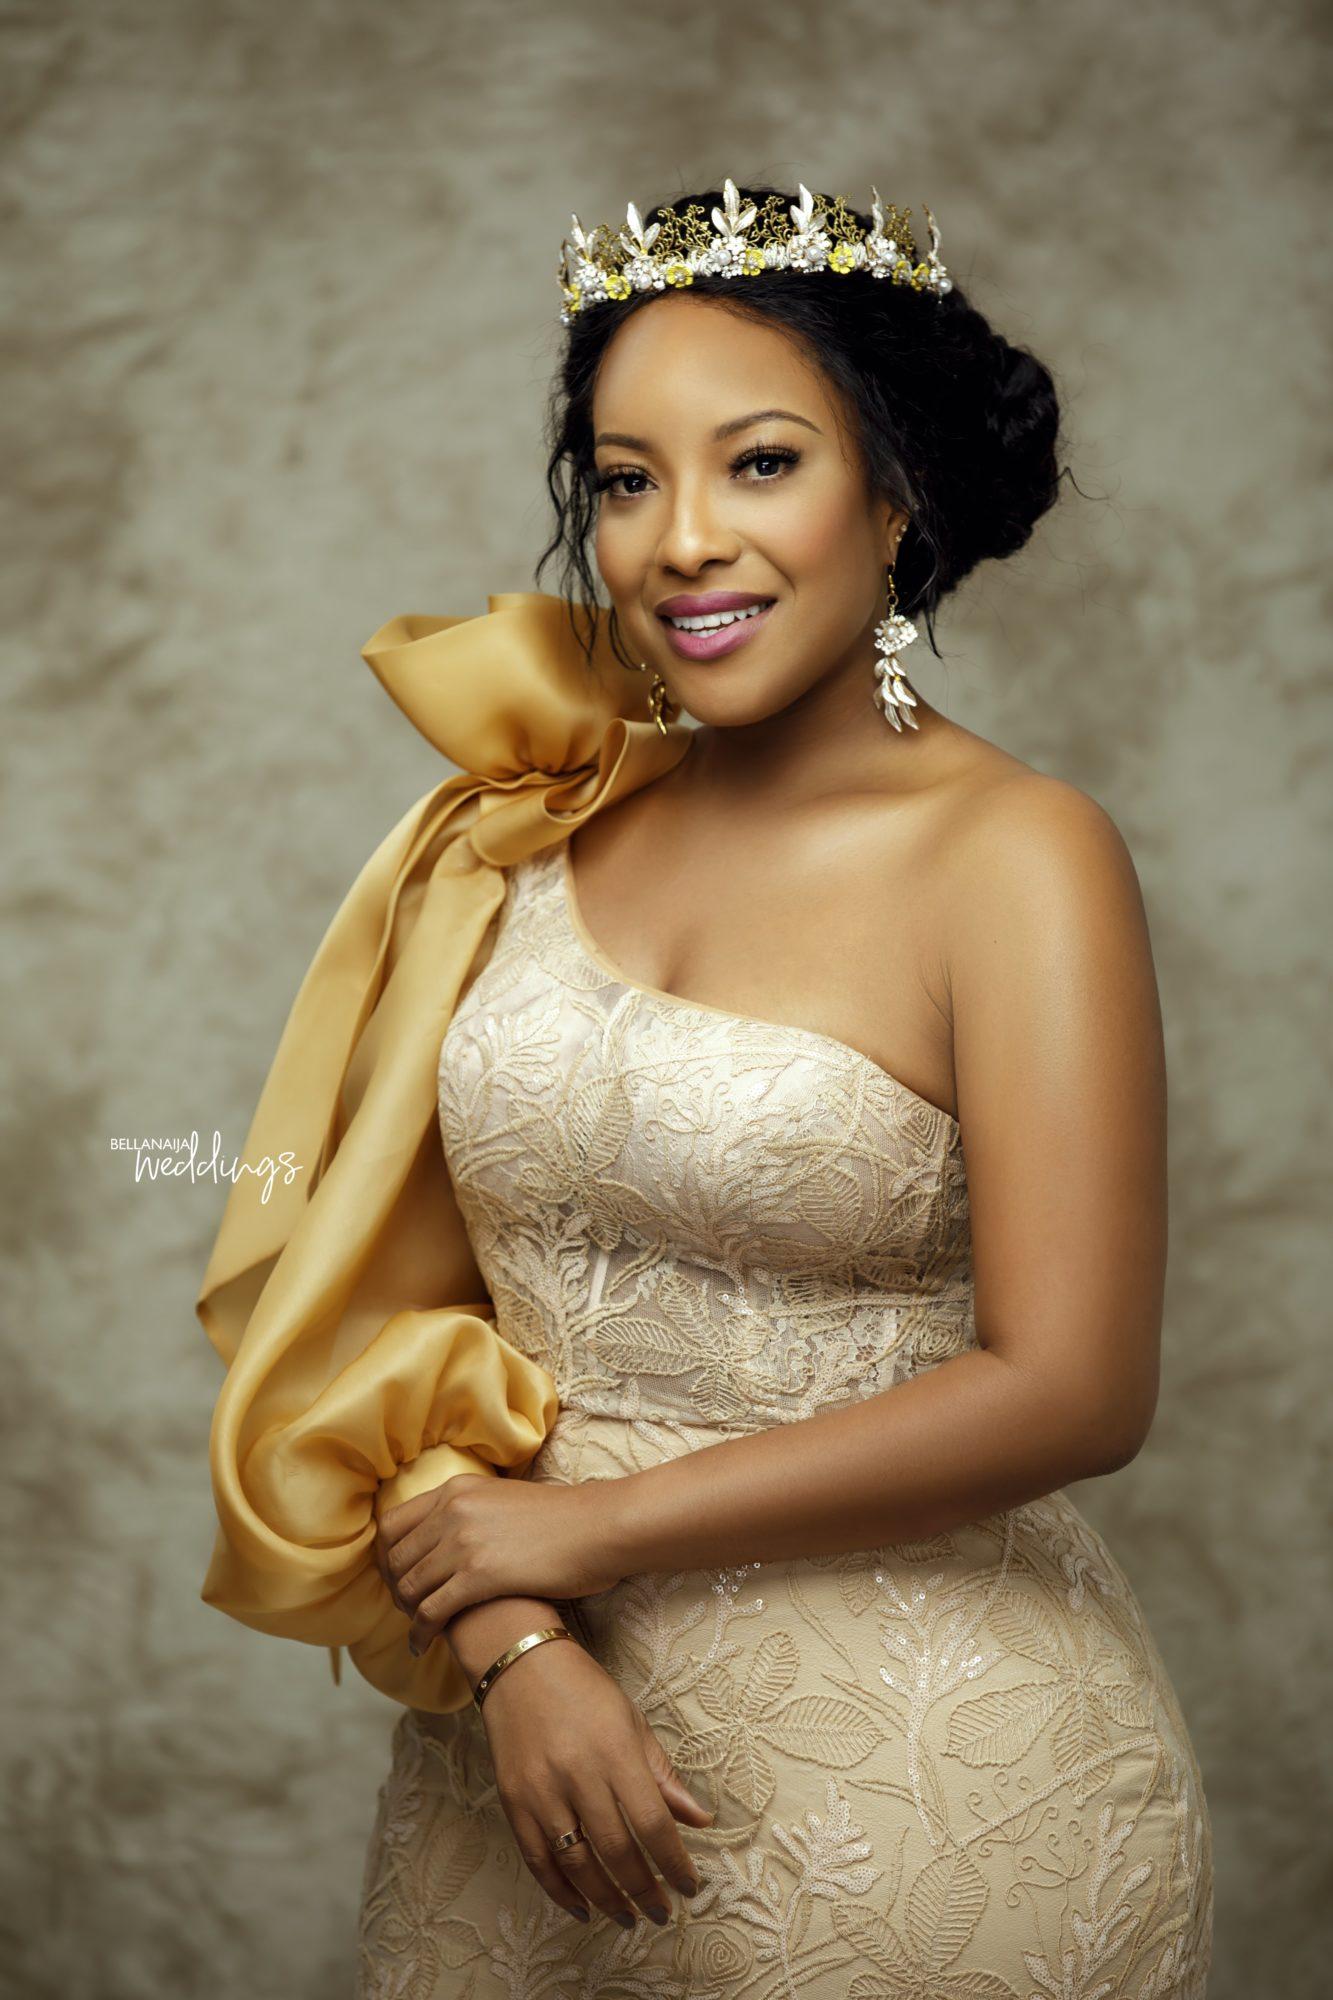 Keep It Chic Like Joselyn Dumas With These Wedding Guest Look Ideas Bellanaija Weddings,Ball Gown Sweetheart Neckline Gorgeous Wedding Dresses